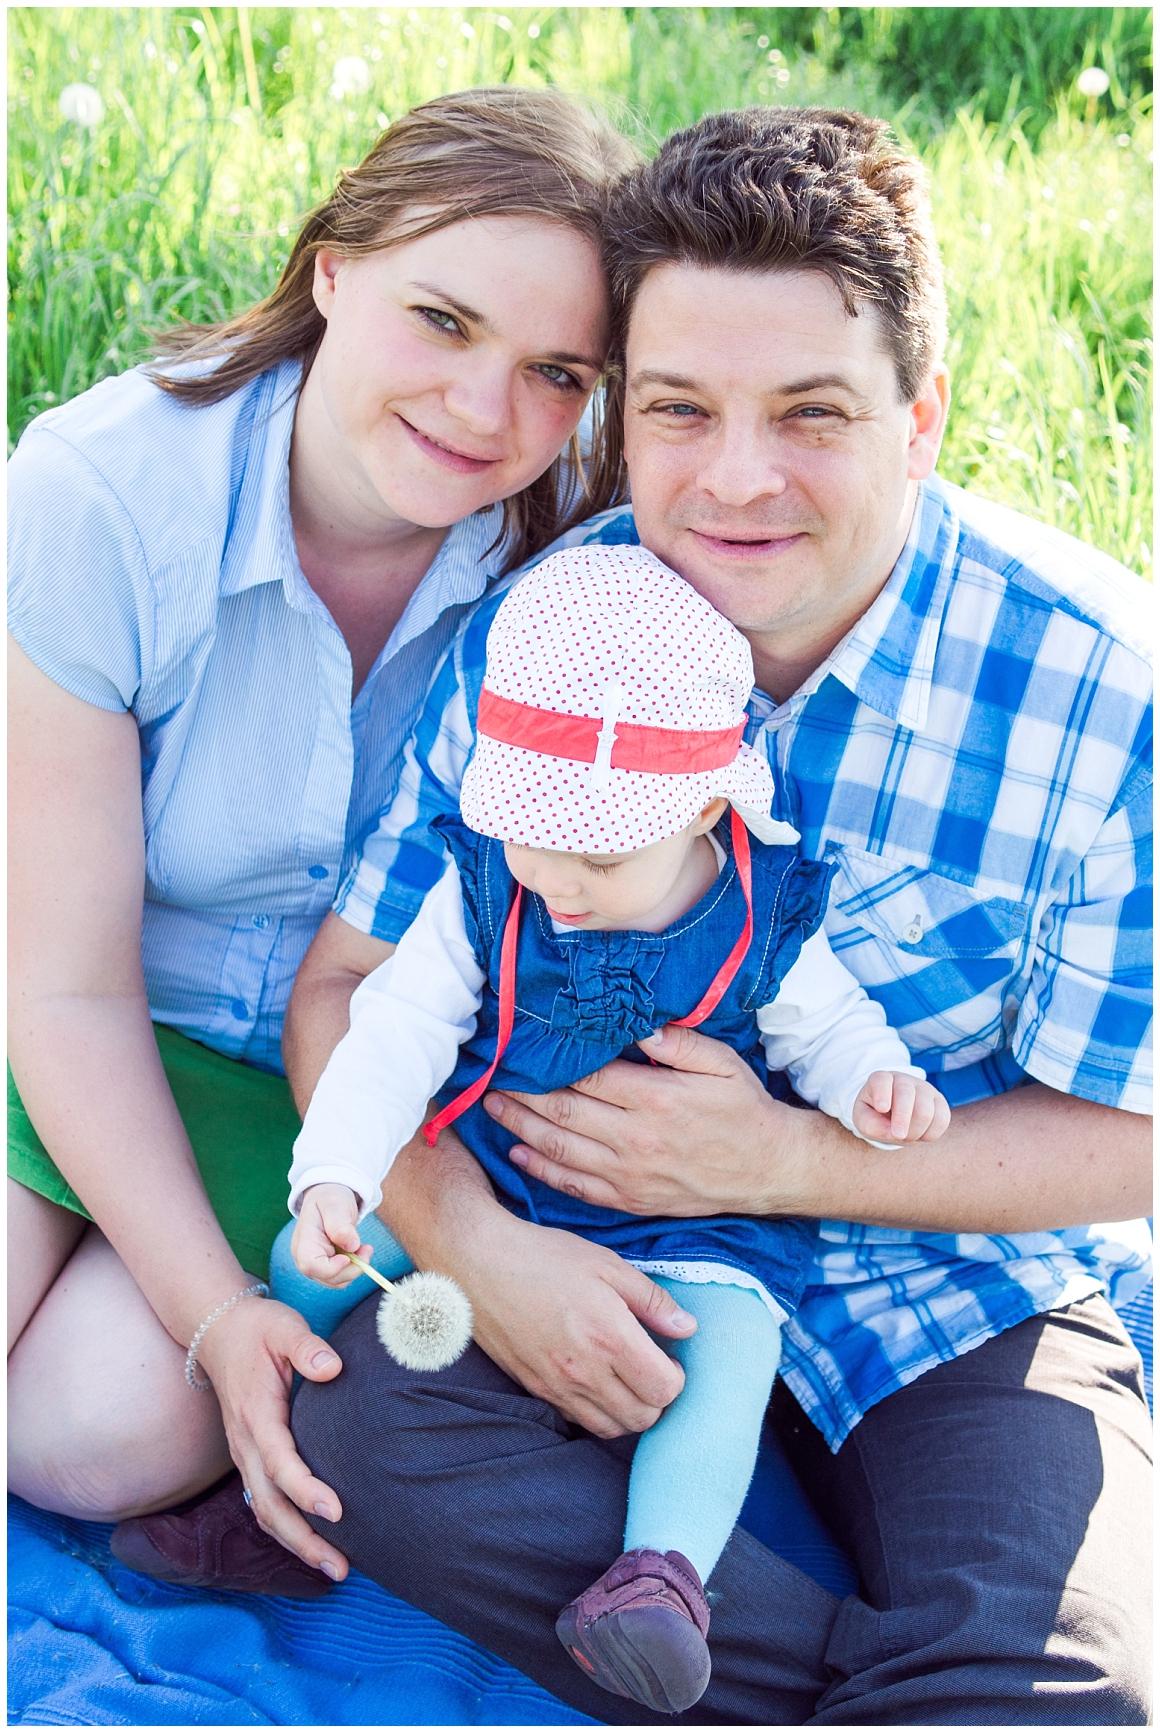 katrin-kind-familien-portrait-fotografie-münchen-rosenheim_0000.jpg